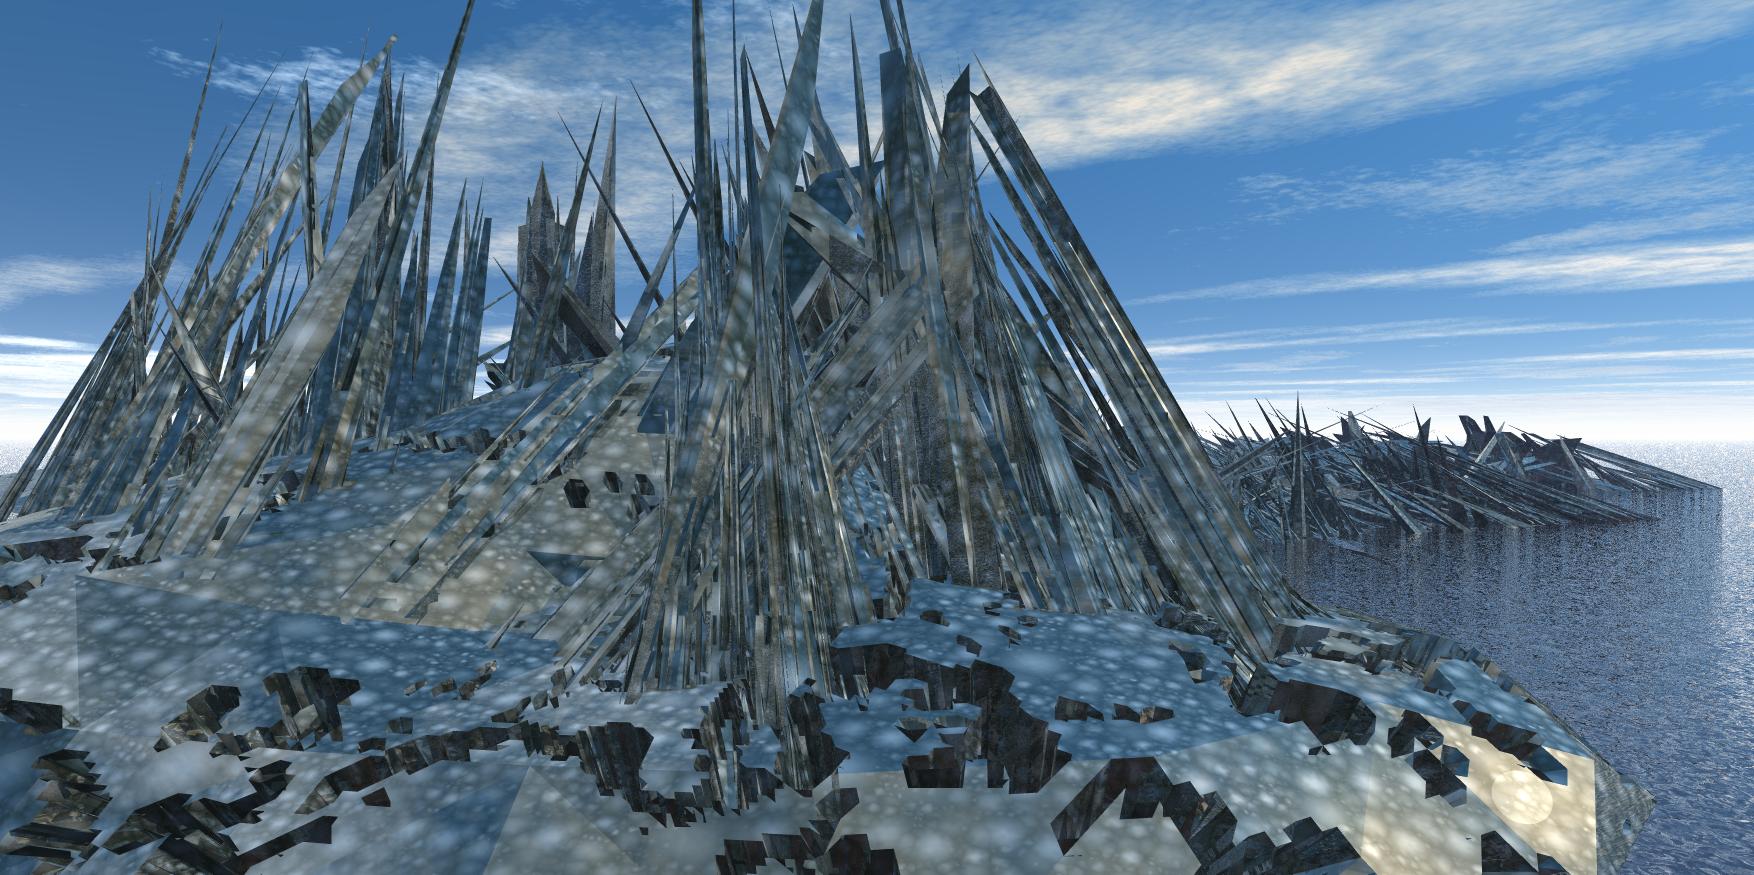 alien crystals2.png